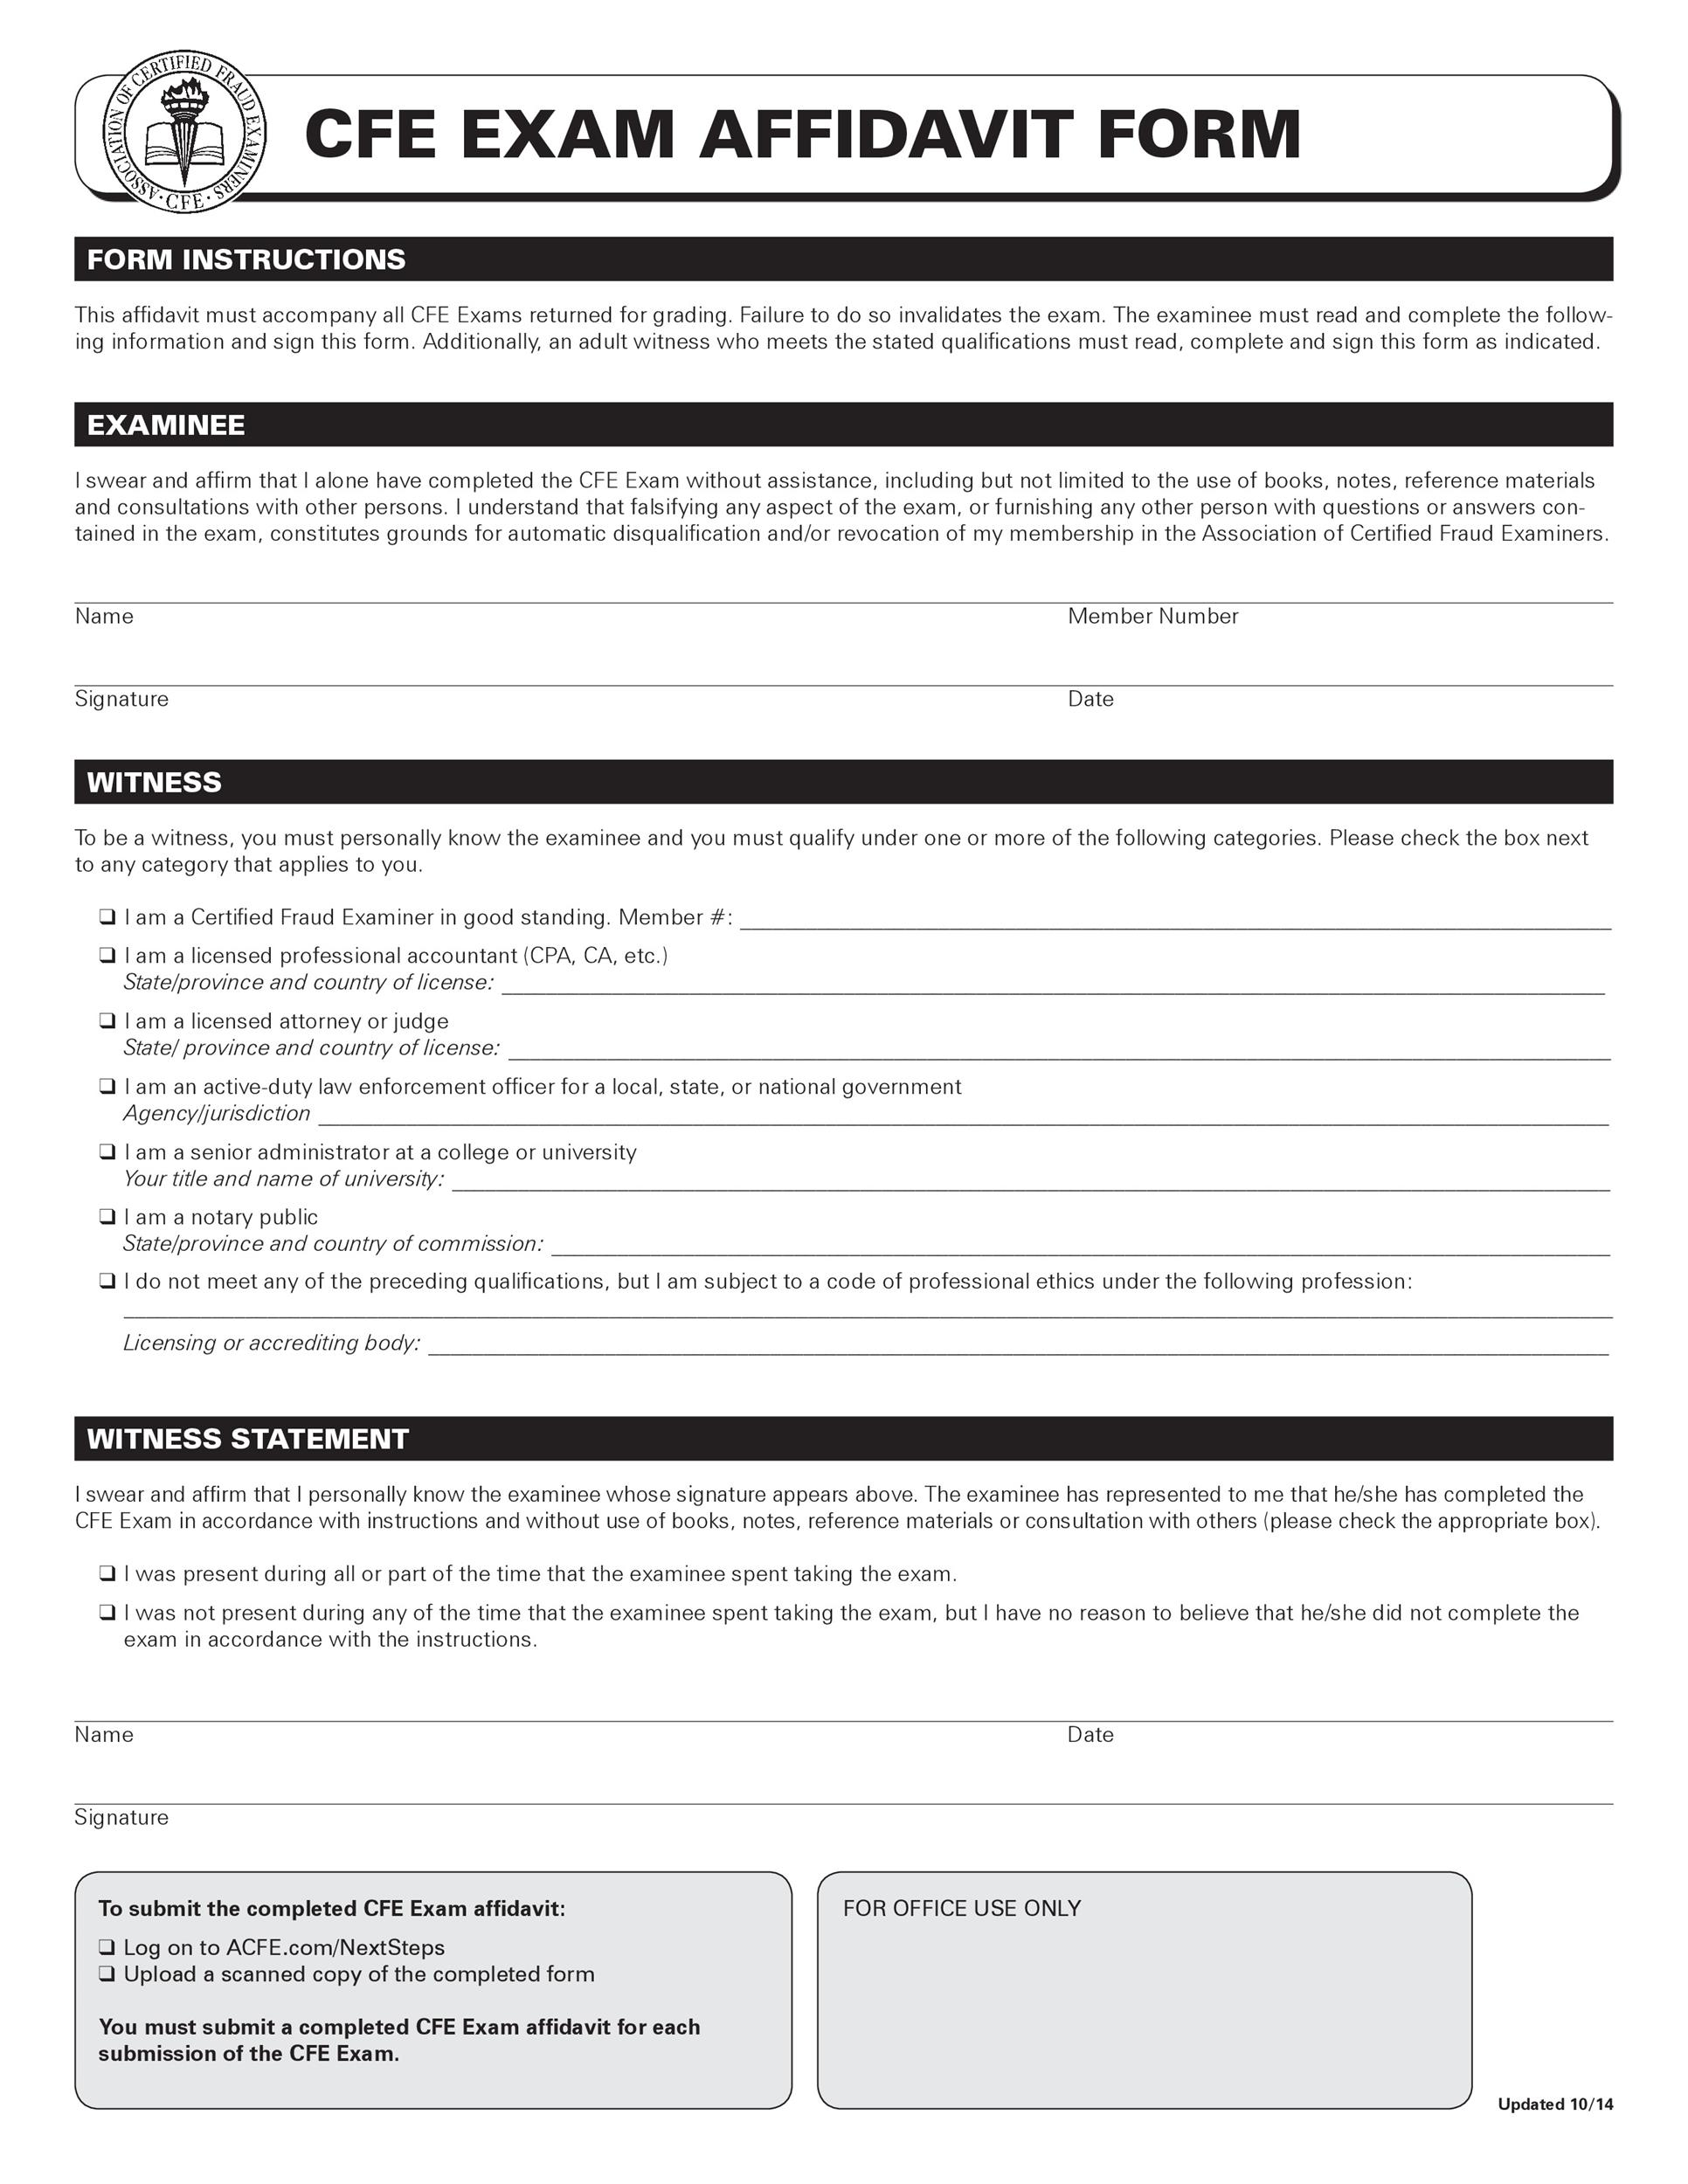 Free affidavit form 26